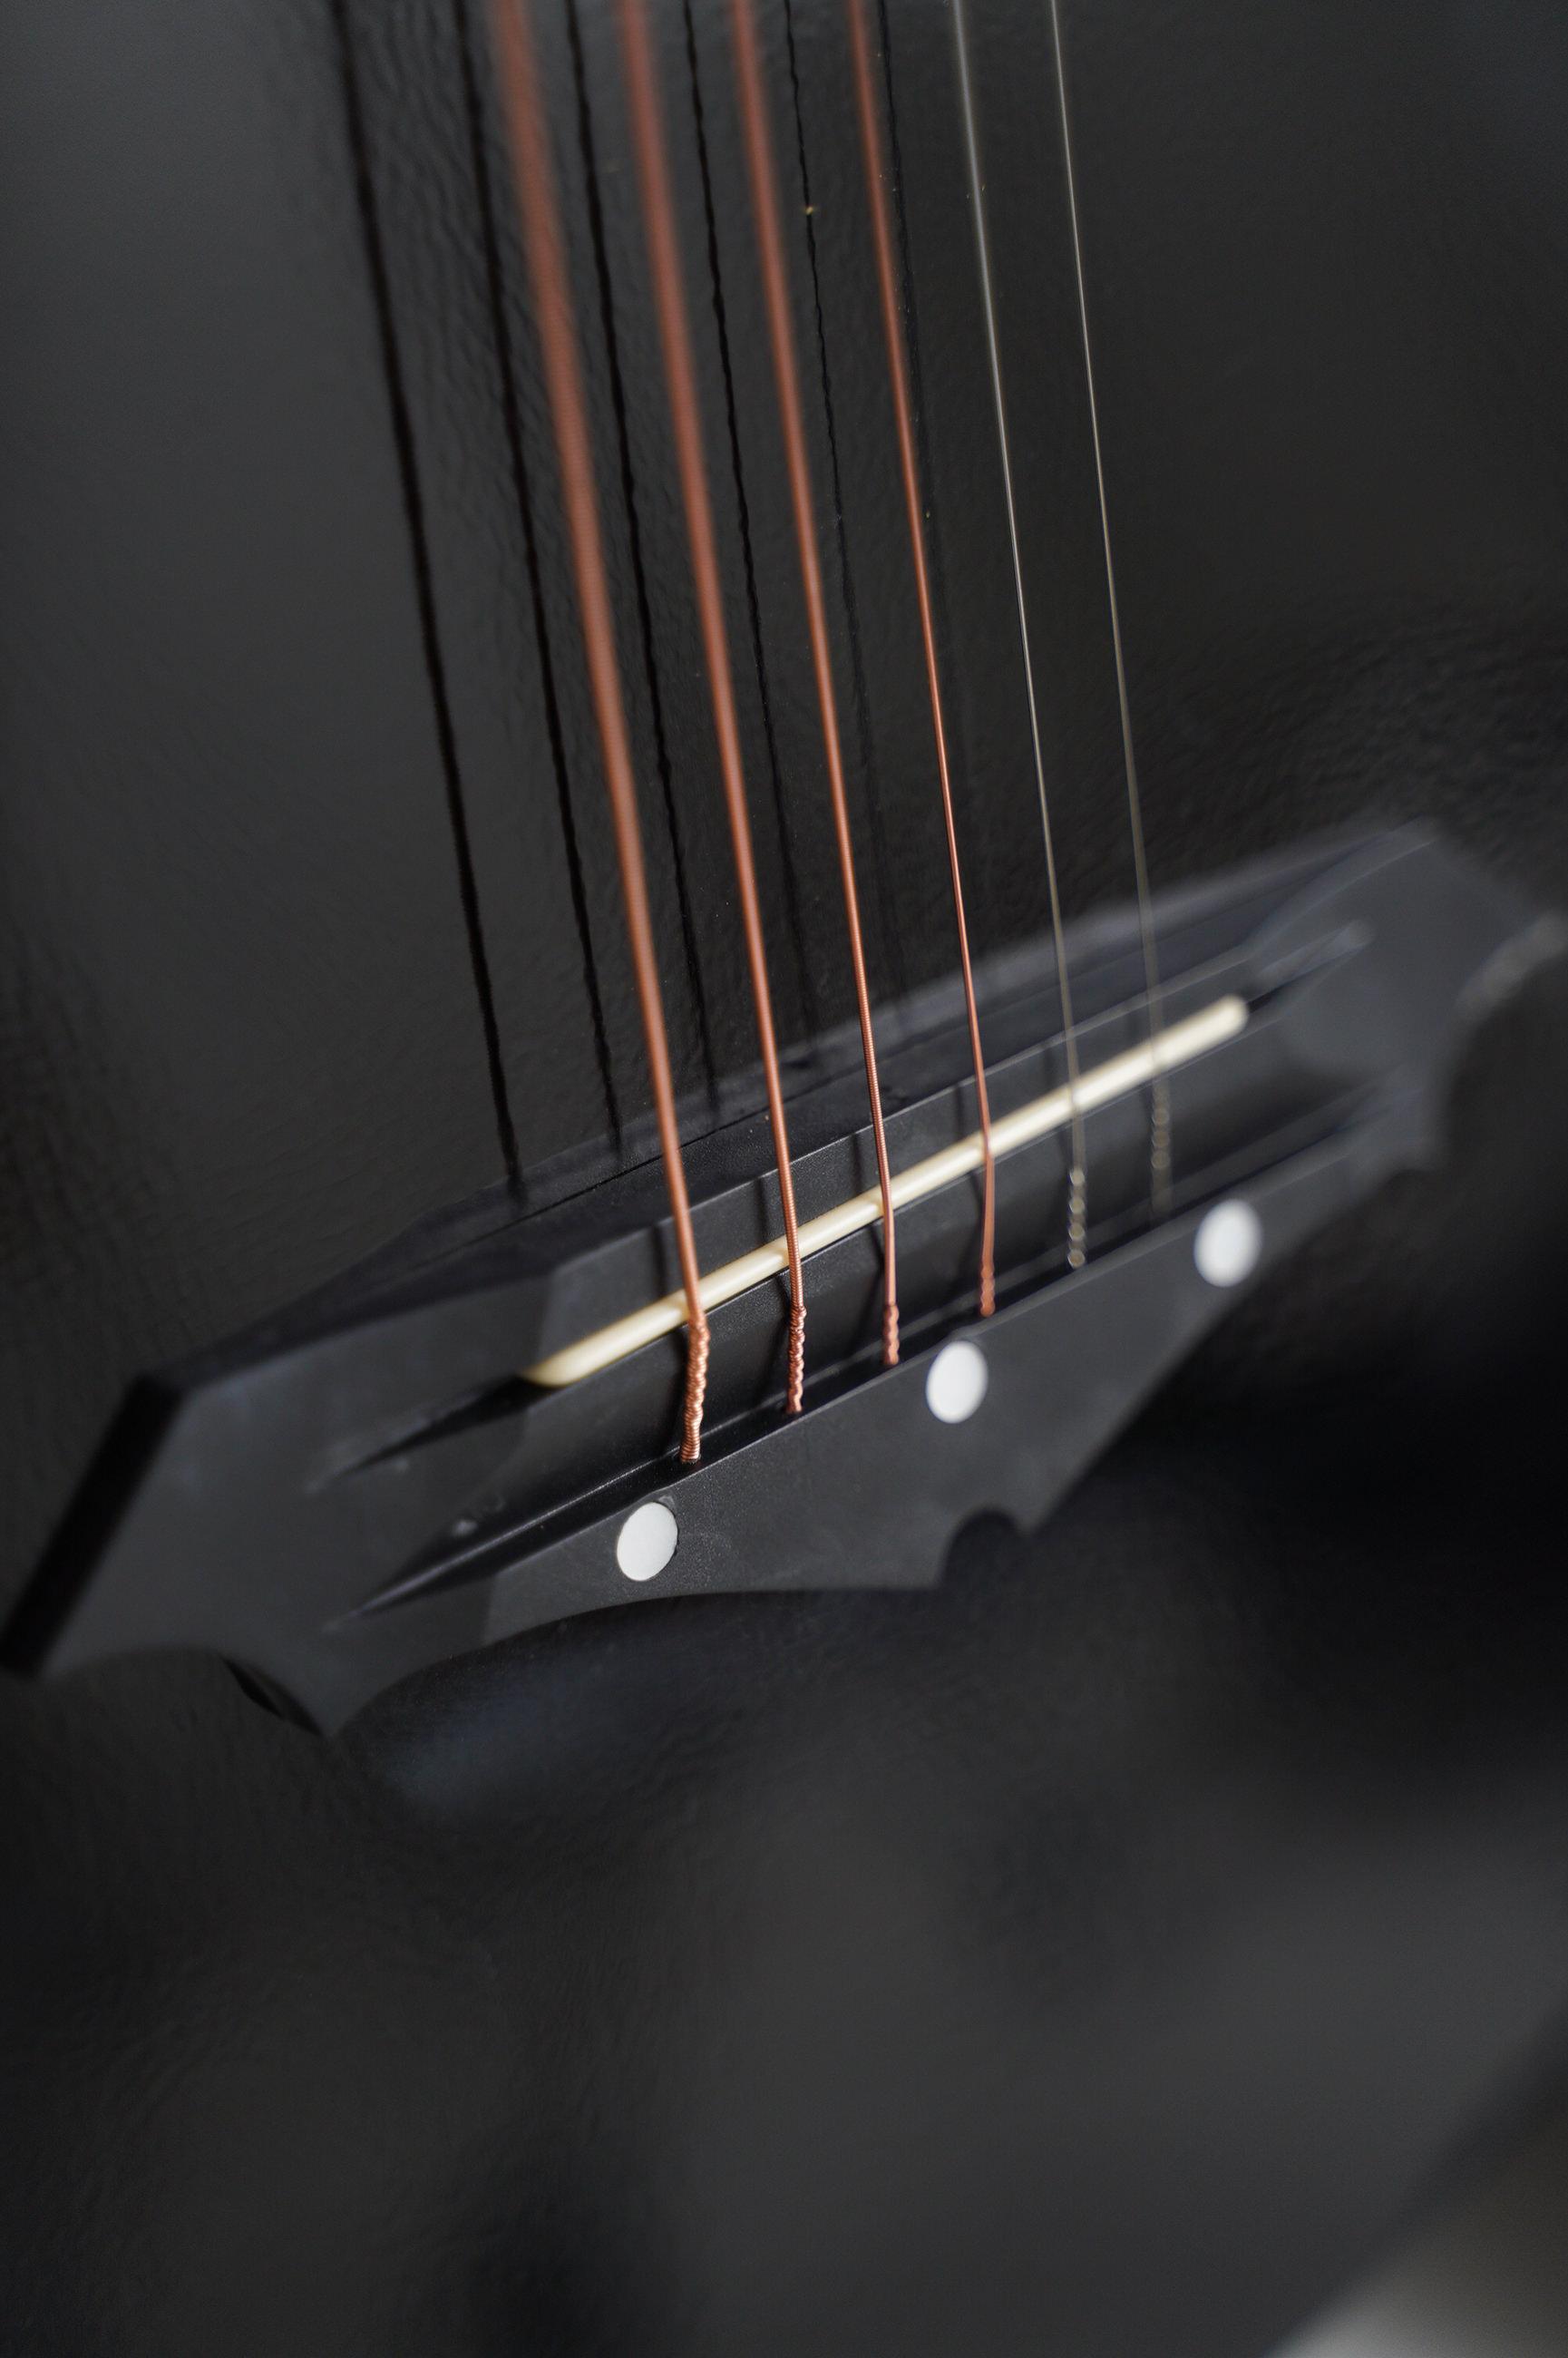 moly-ag-38-bk-acoustic-guitar-singapore-4.jpg